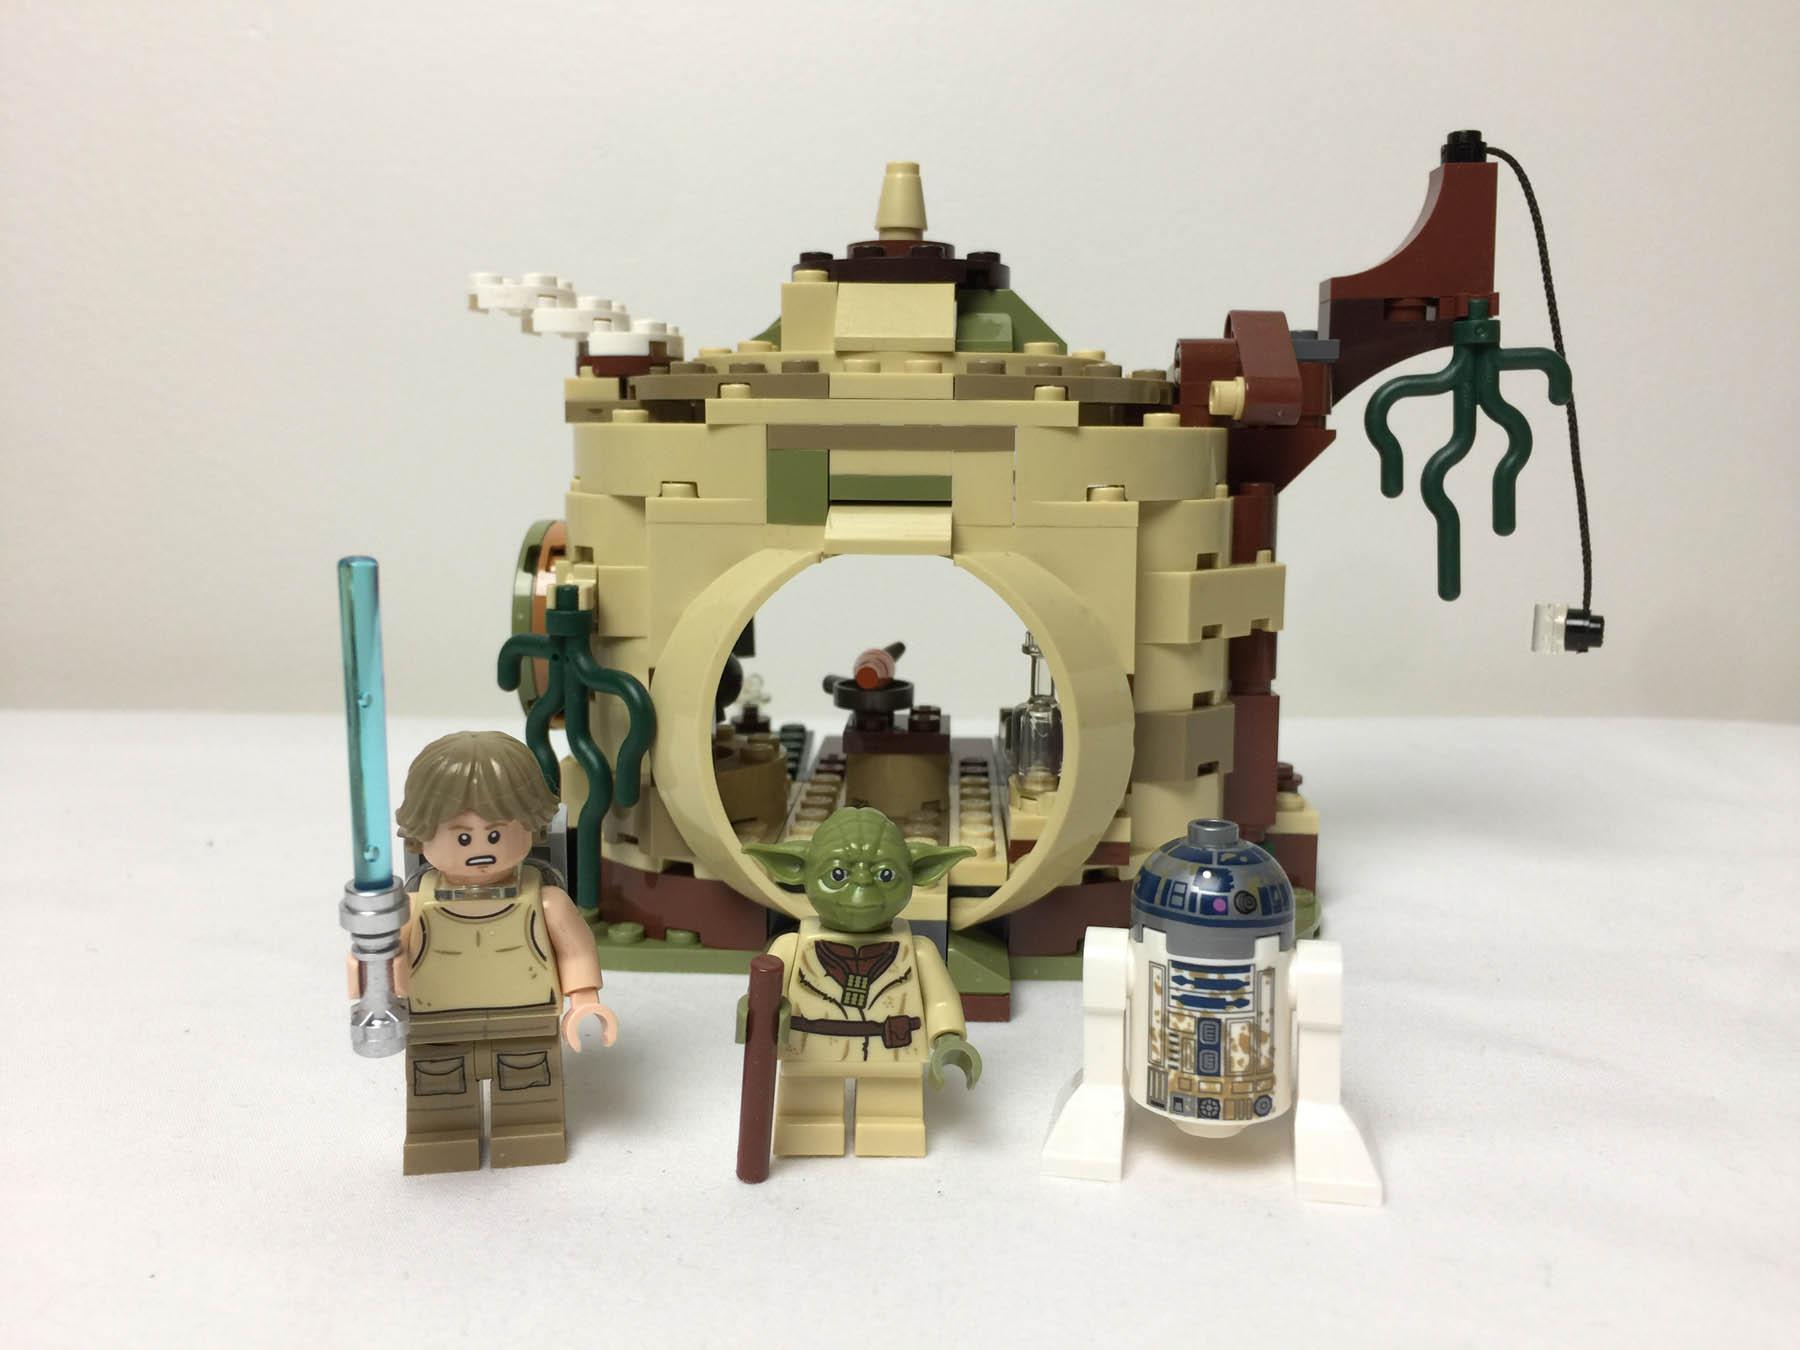 lego star wars review 75208 yoda's hut  fbtb